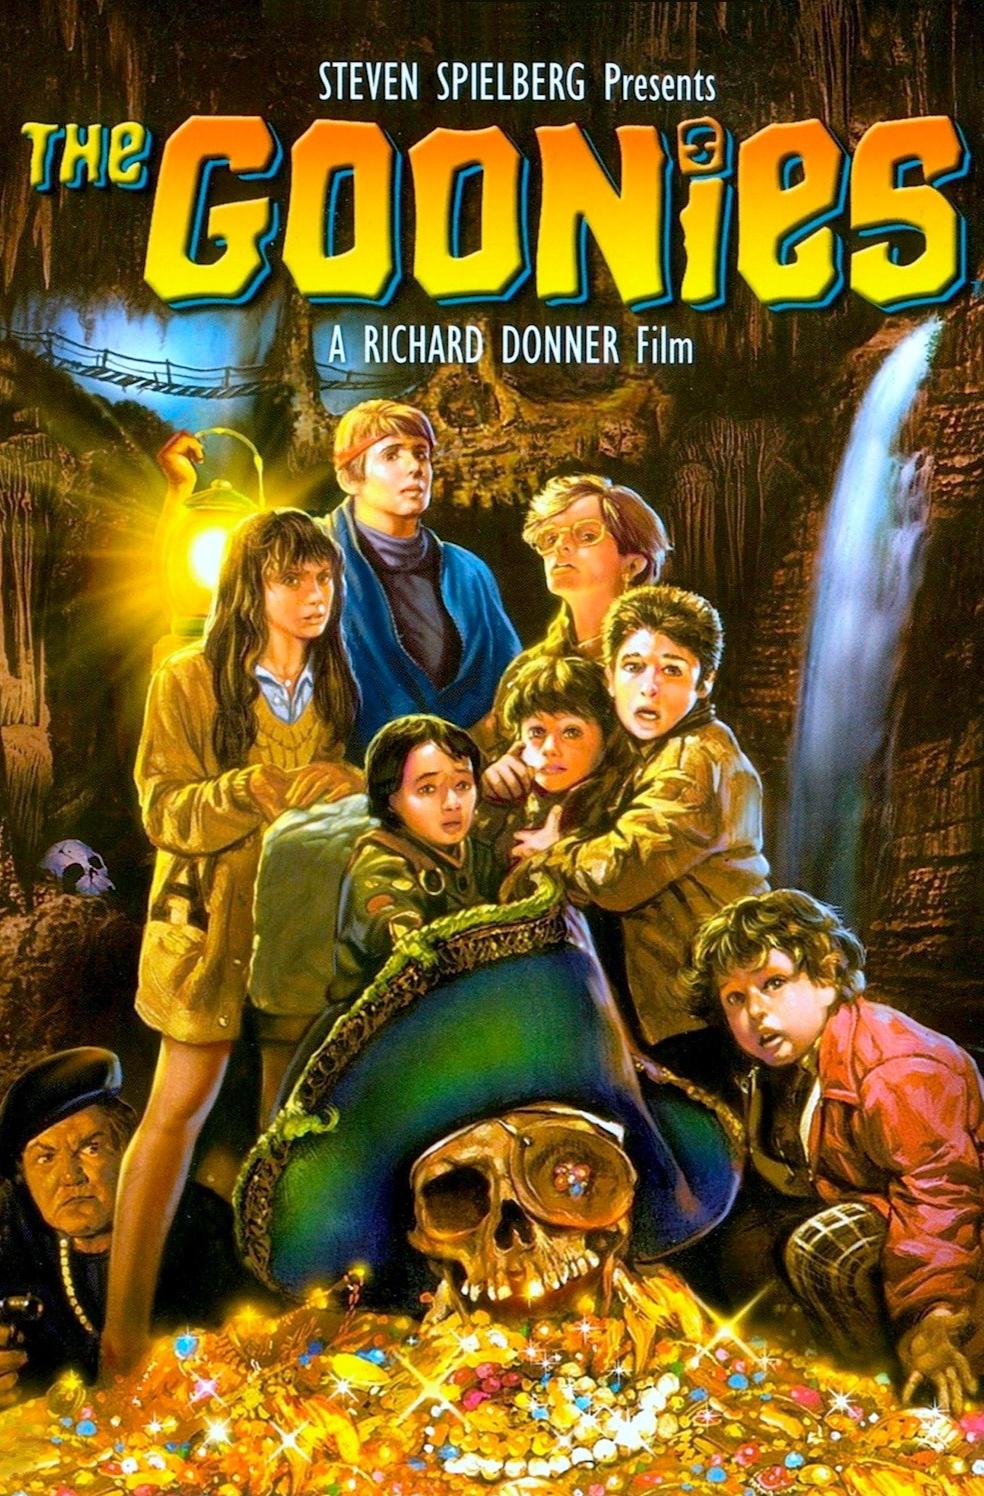 THE GOONIES (12A) 1985